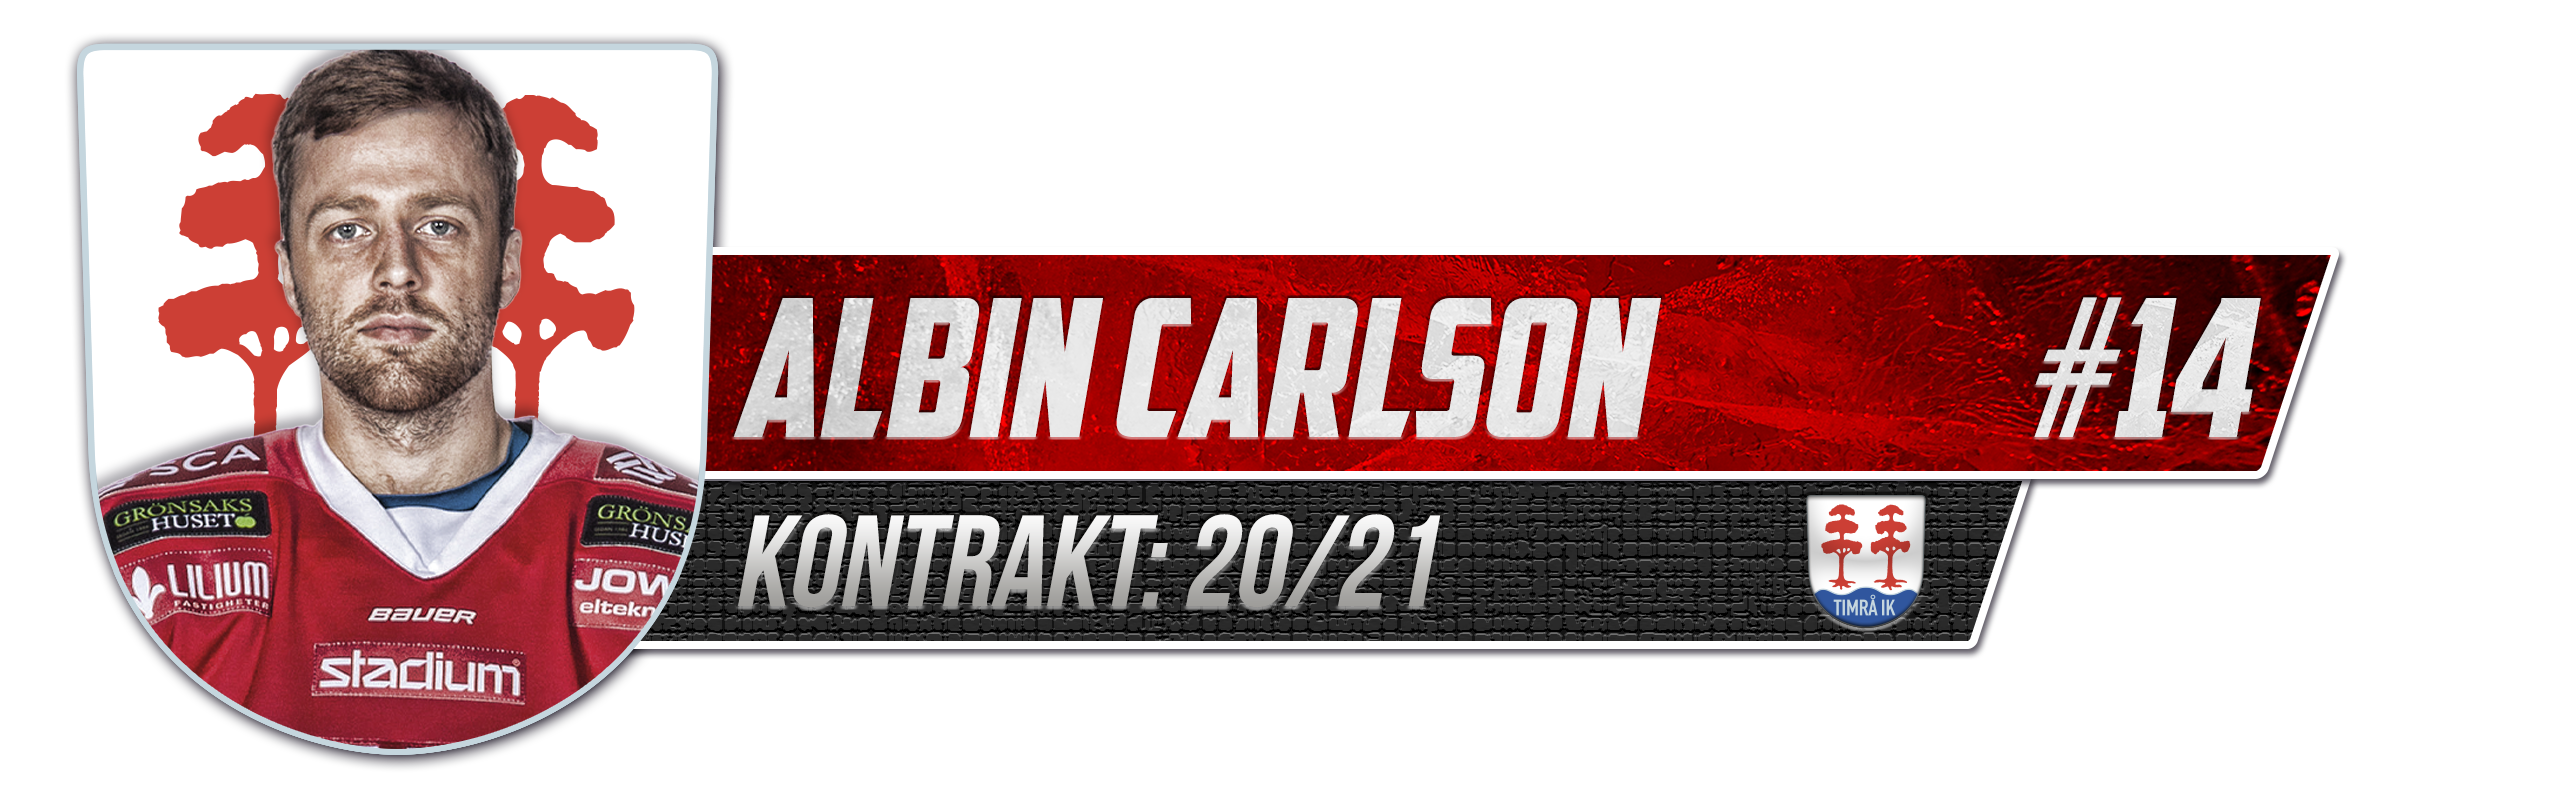 Albin Carlson